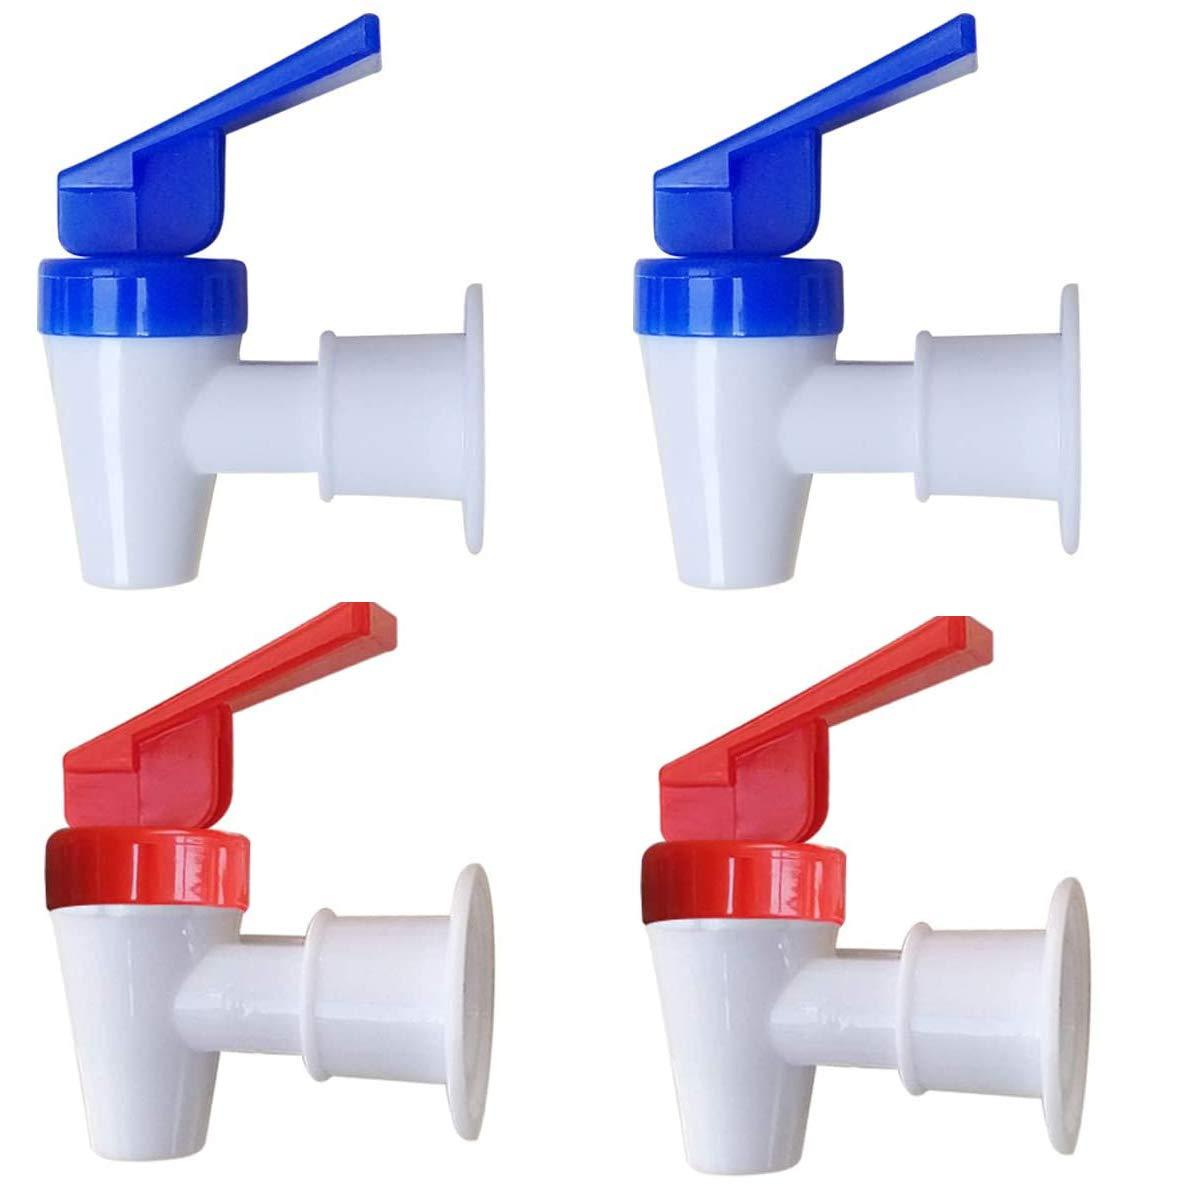 Replacement Cooler Faucet, Internal Thread Spigot of Water Filter Dispenser,Reusable Spigot Spout Water Beverage Lever Pour Dispenser Valve Water Crock Water Tap,4 Pieces,Blue/Red